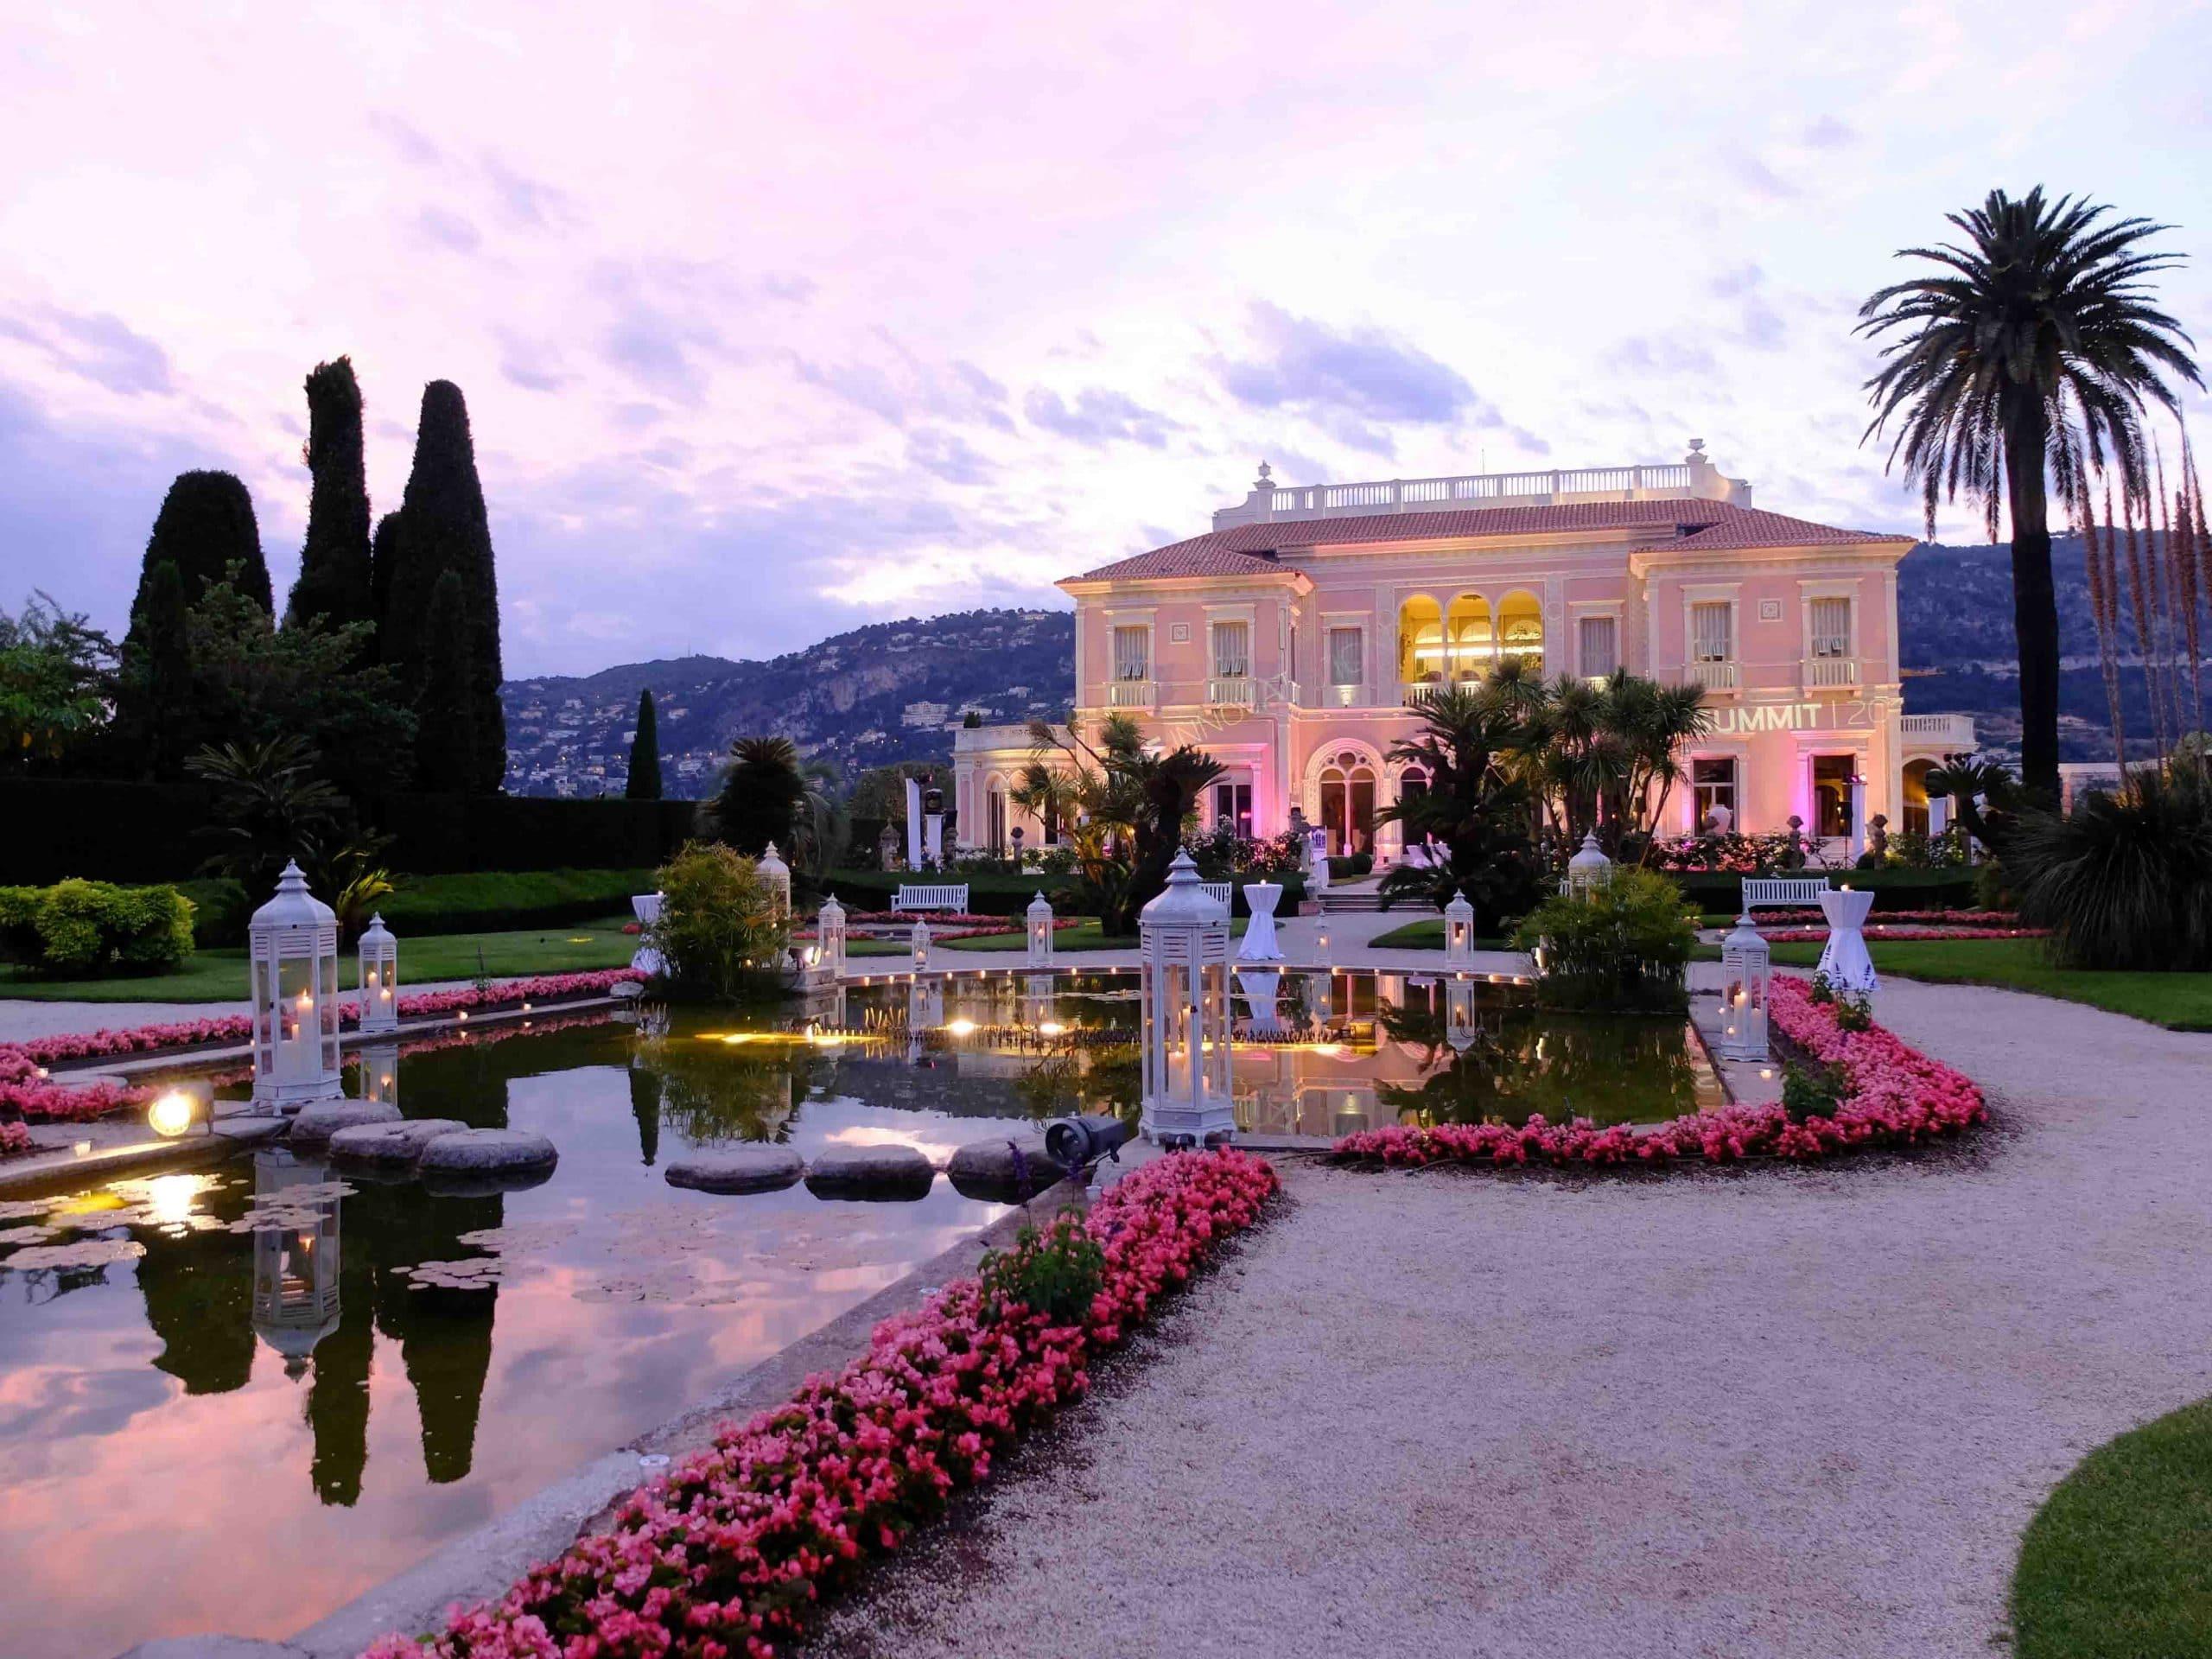 Nocturnes at the Villa Ephrussi de Rothschild